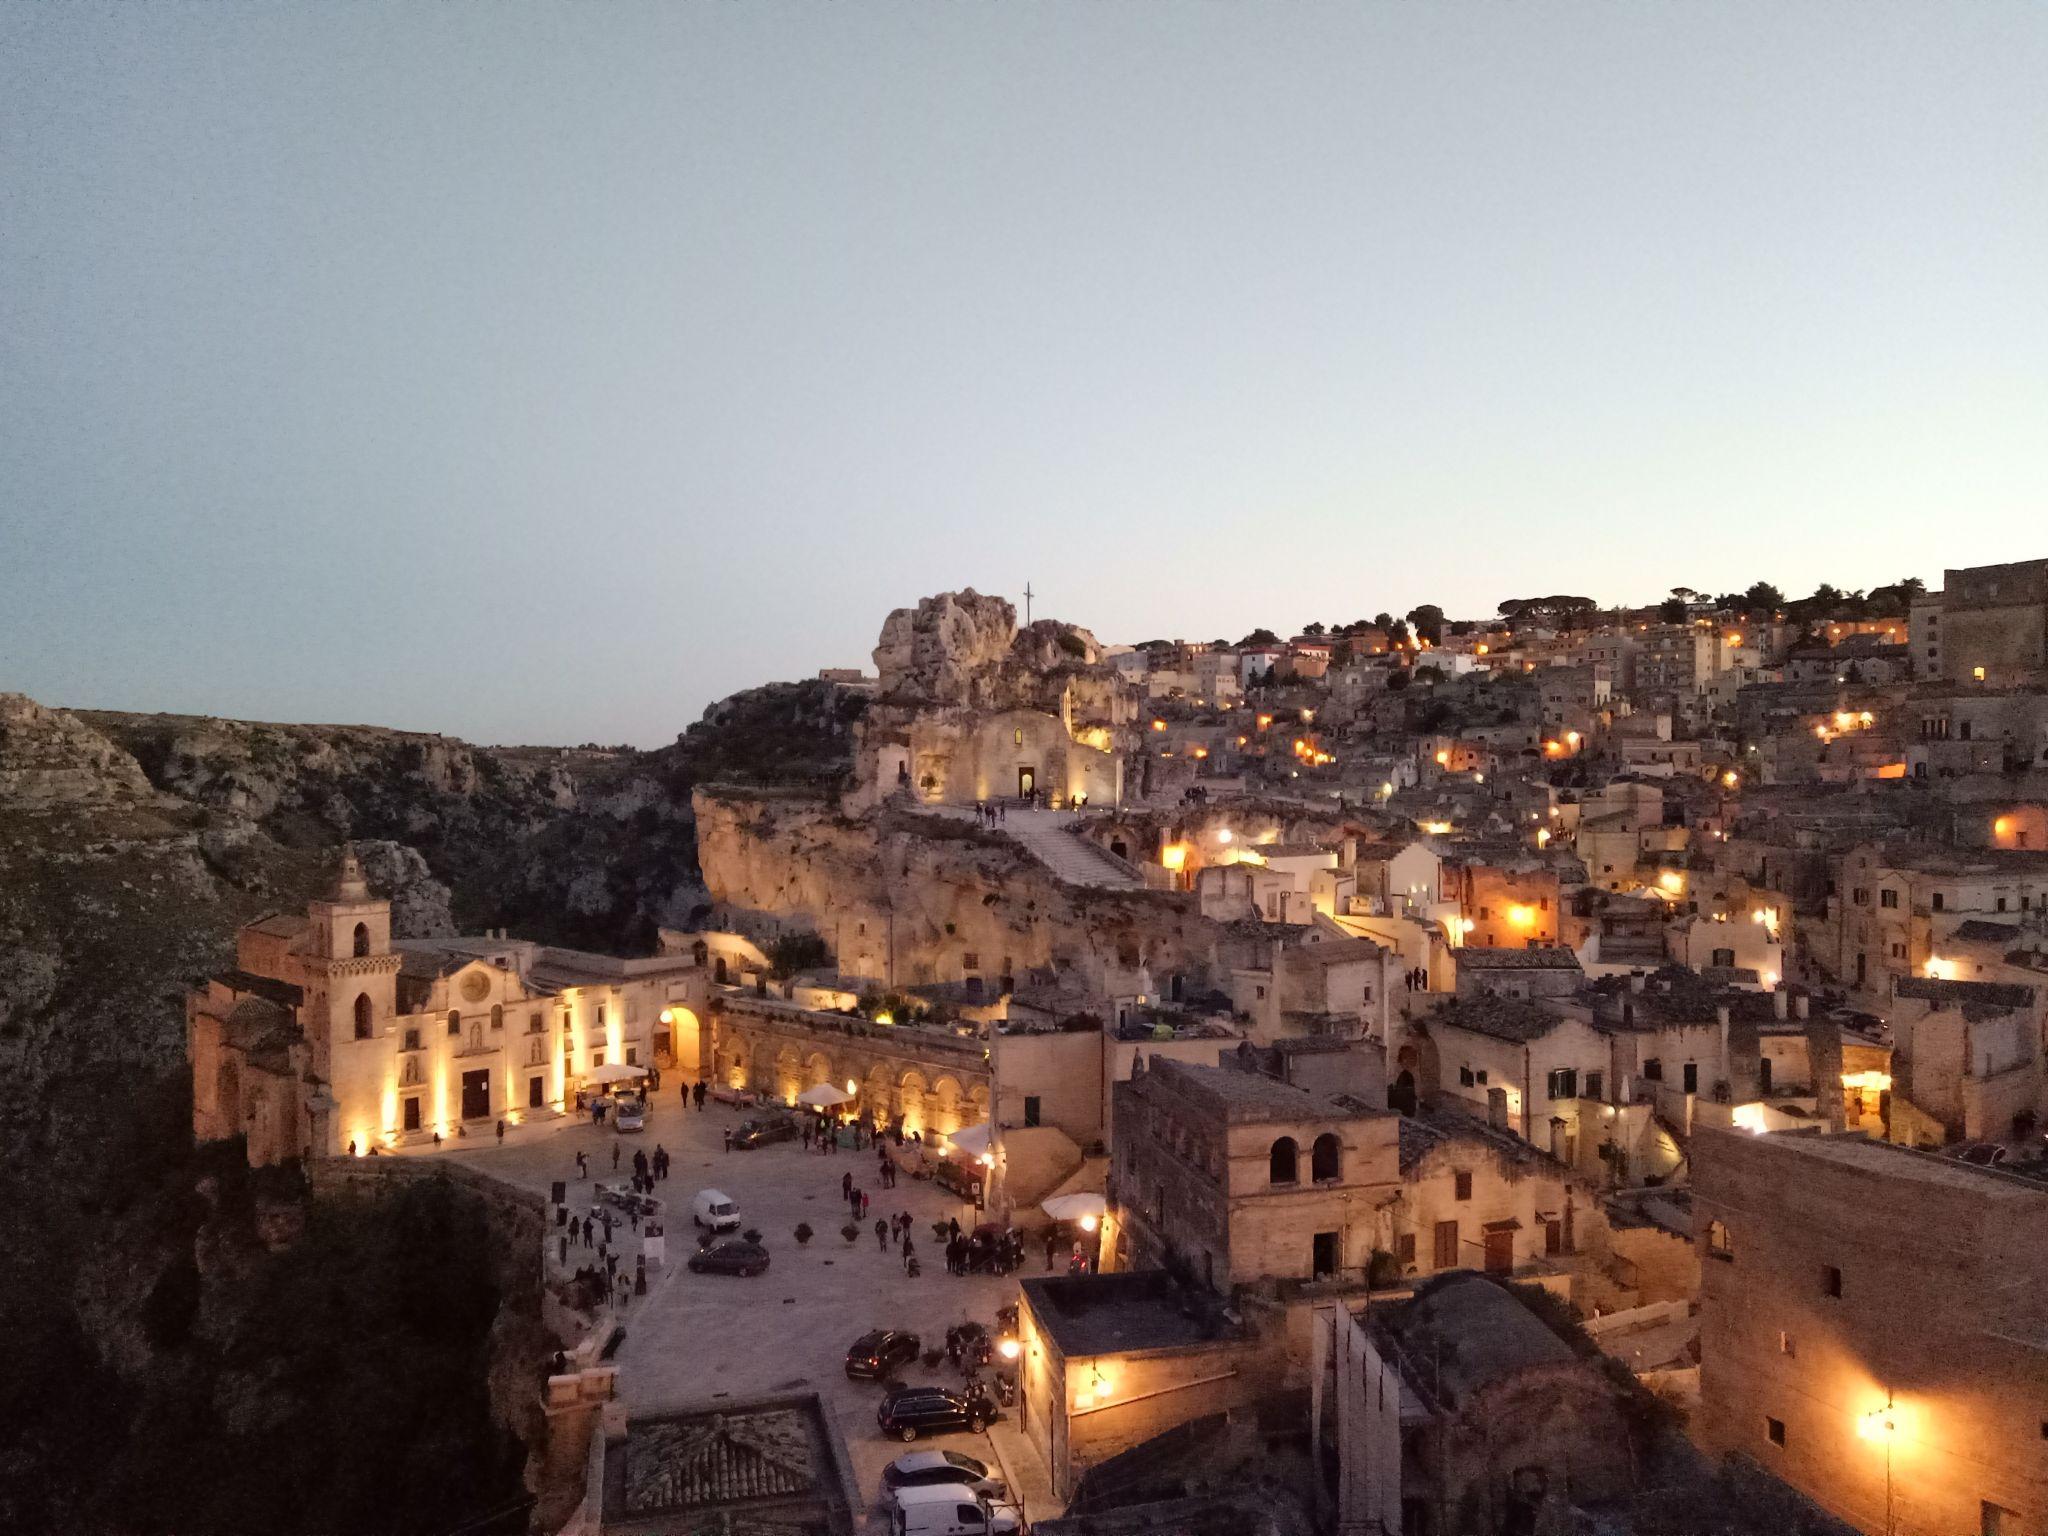 View over Sasso Caveoso, Italy